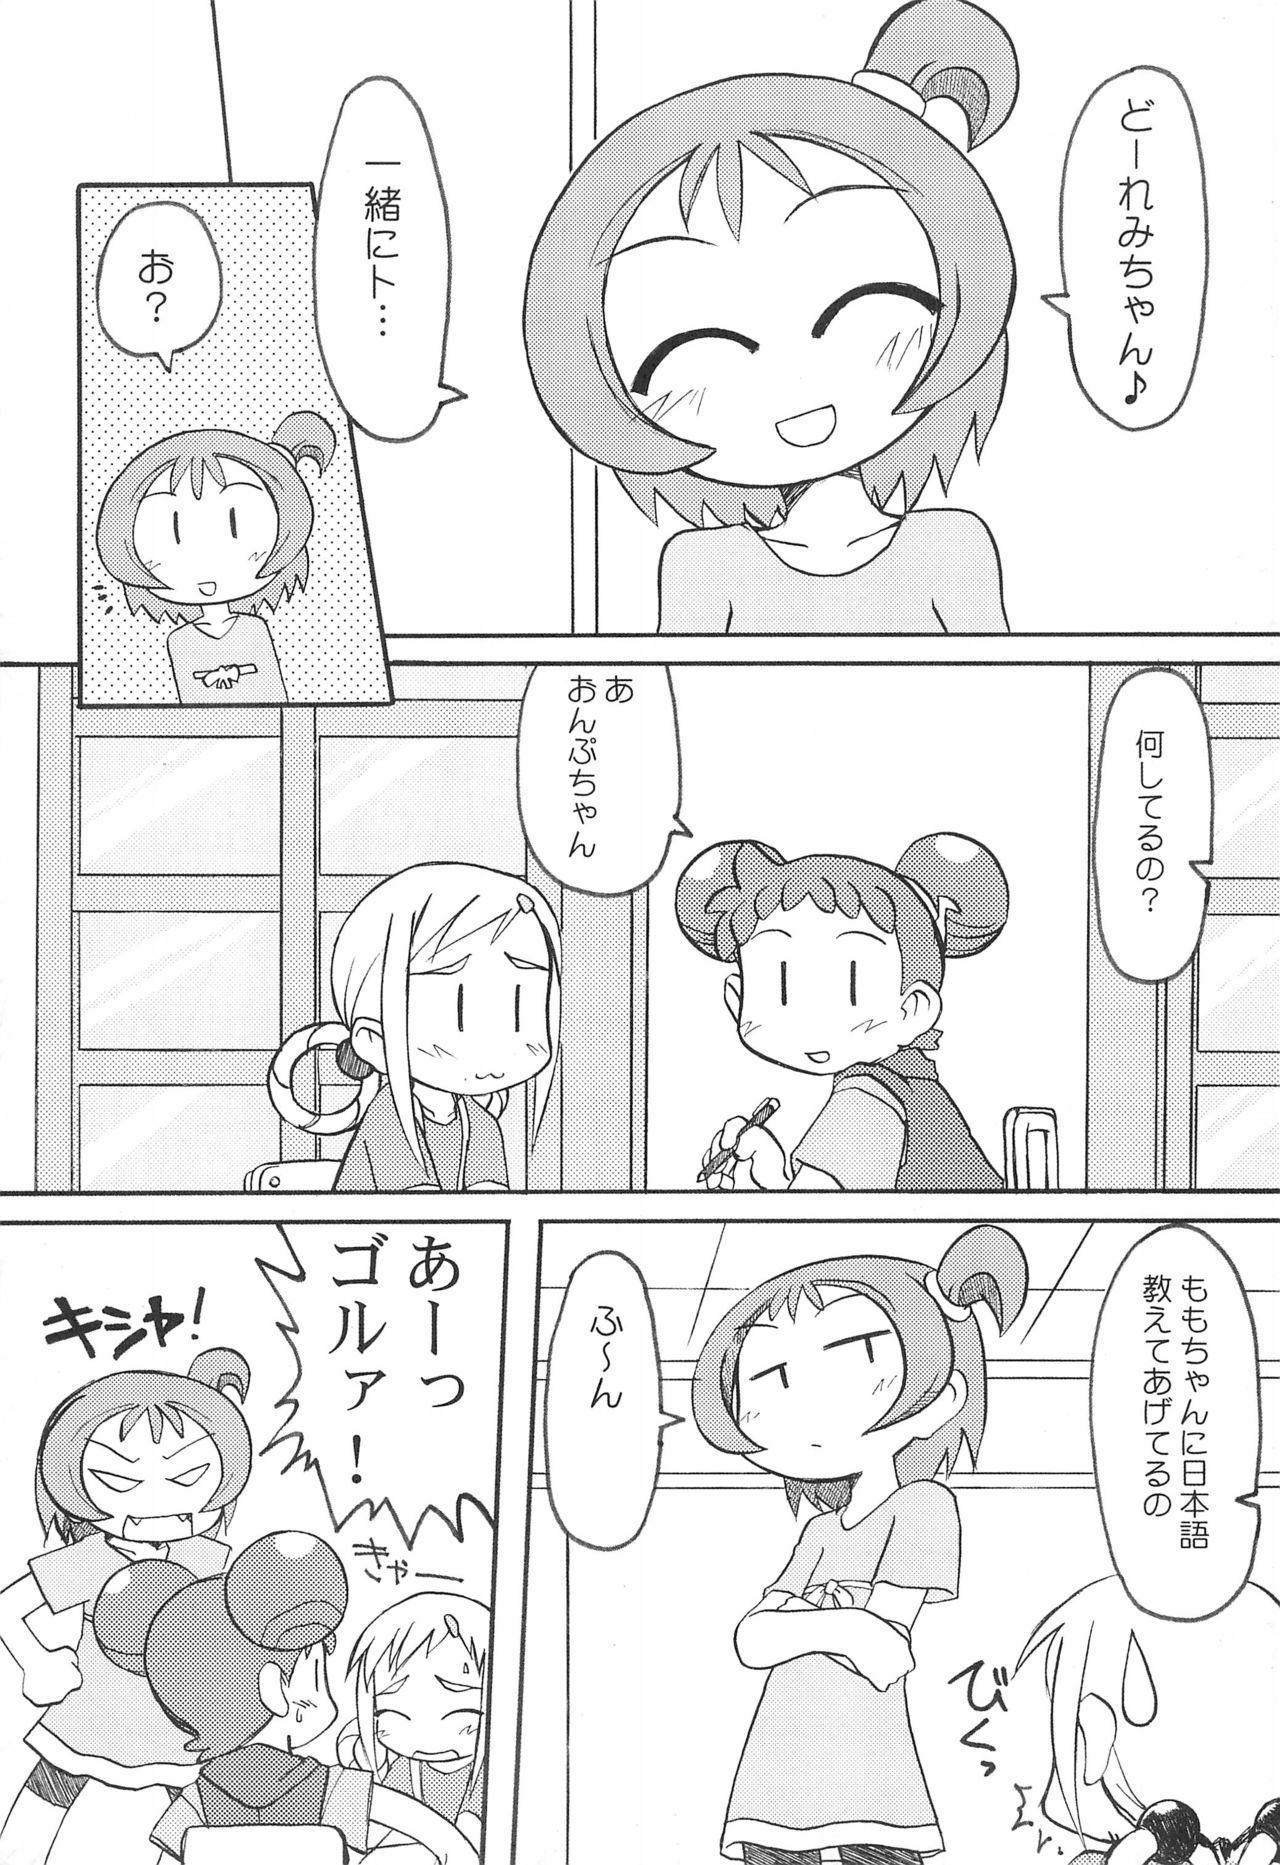 Momo no Kanzume 4